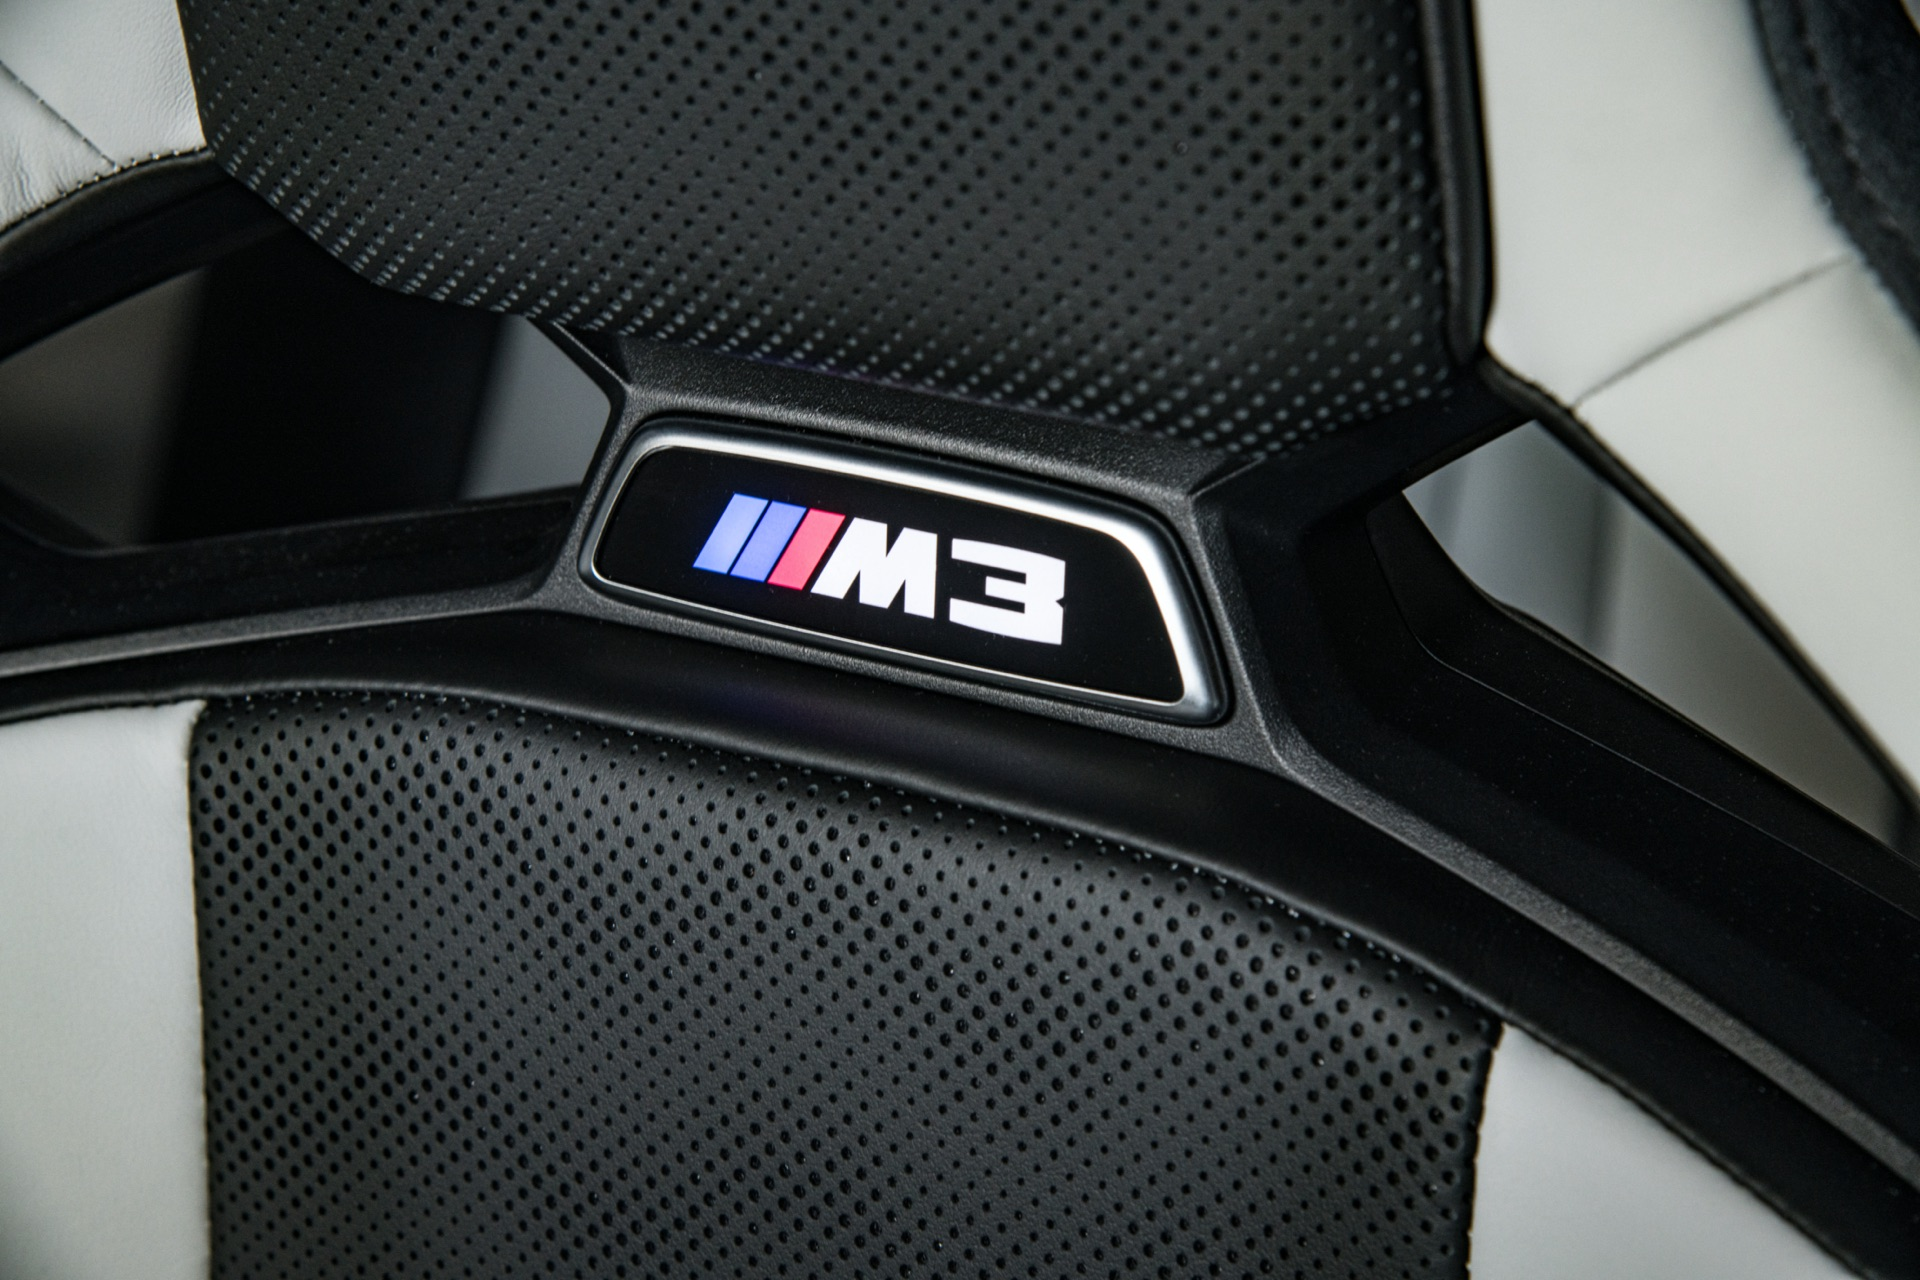 M3 badge